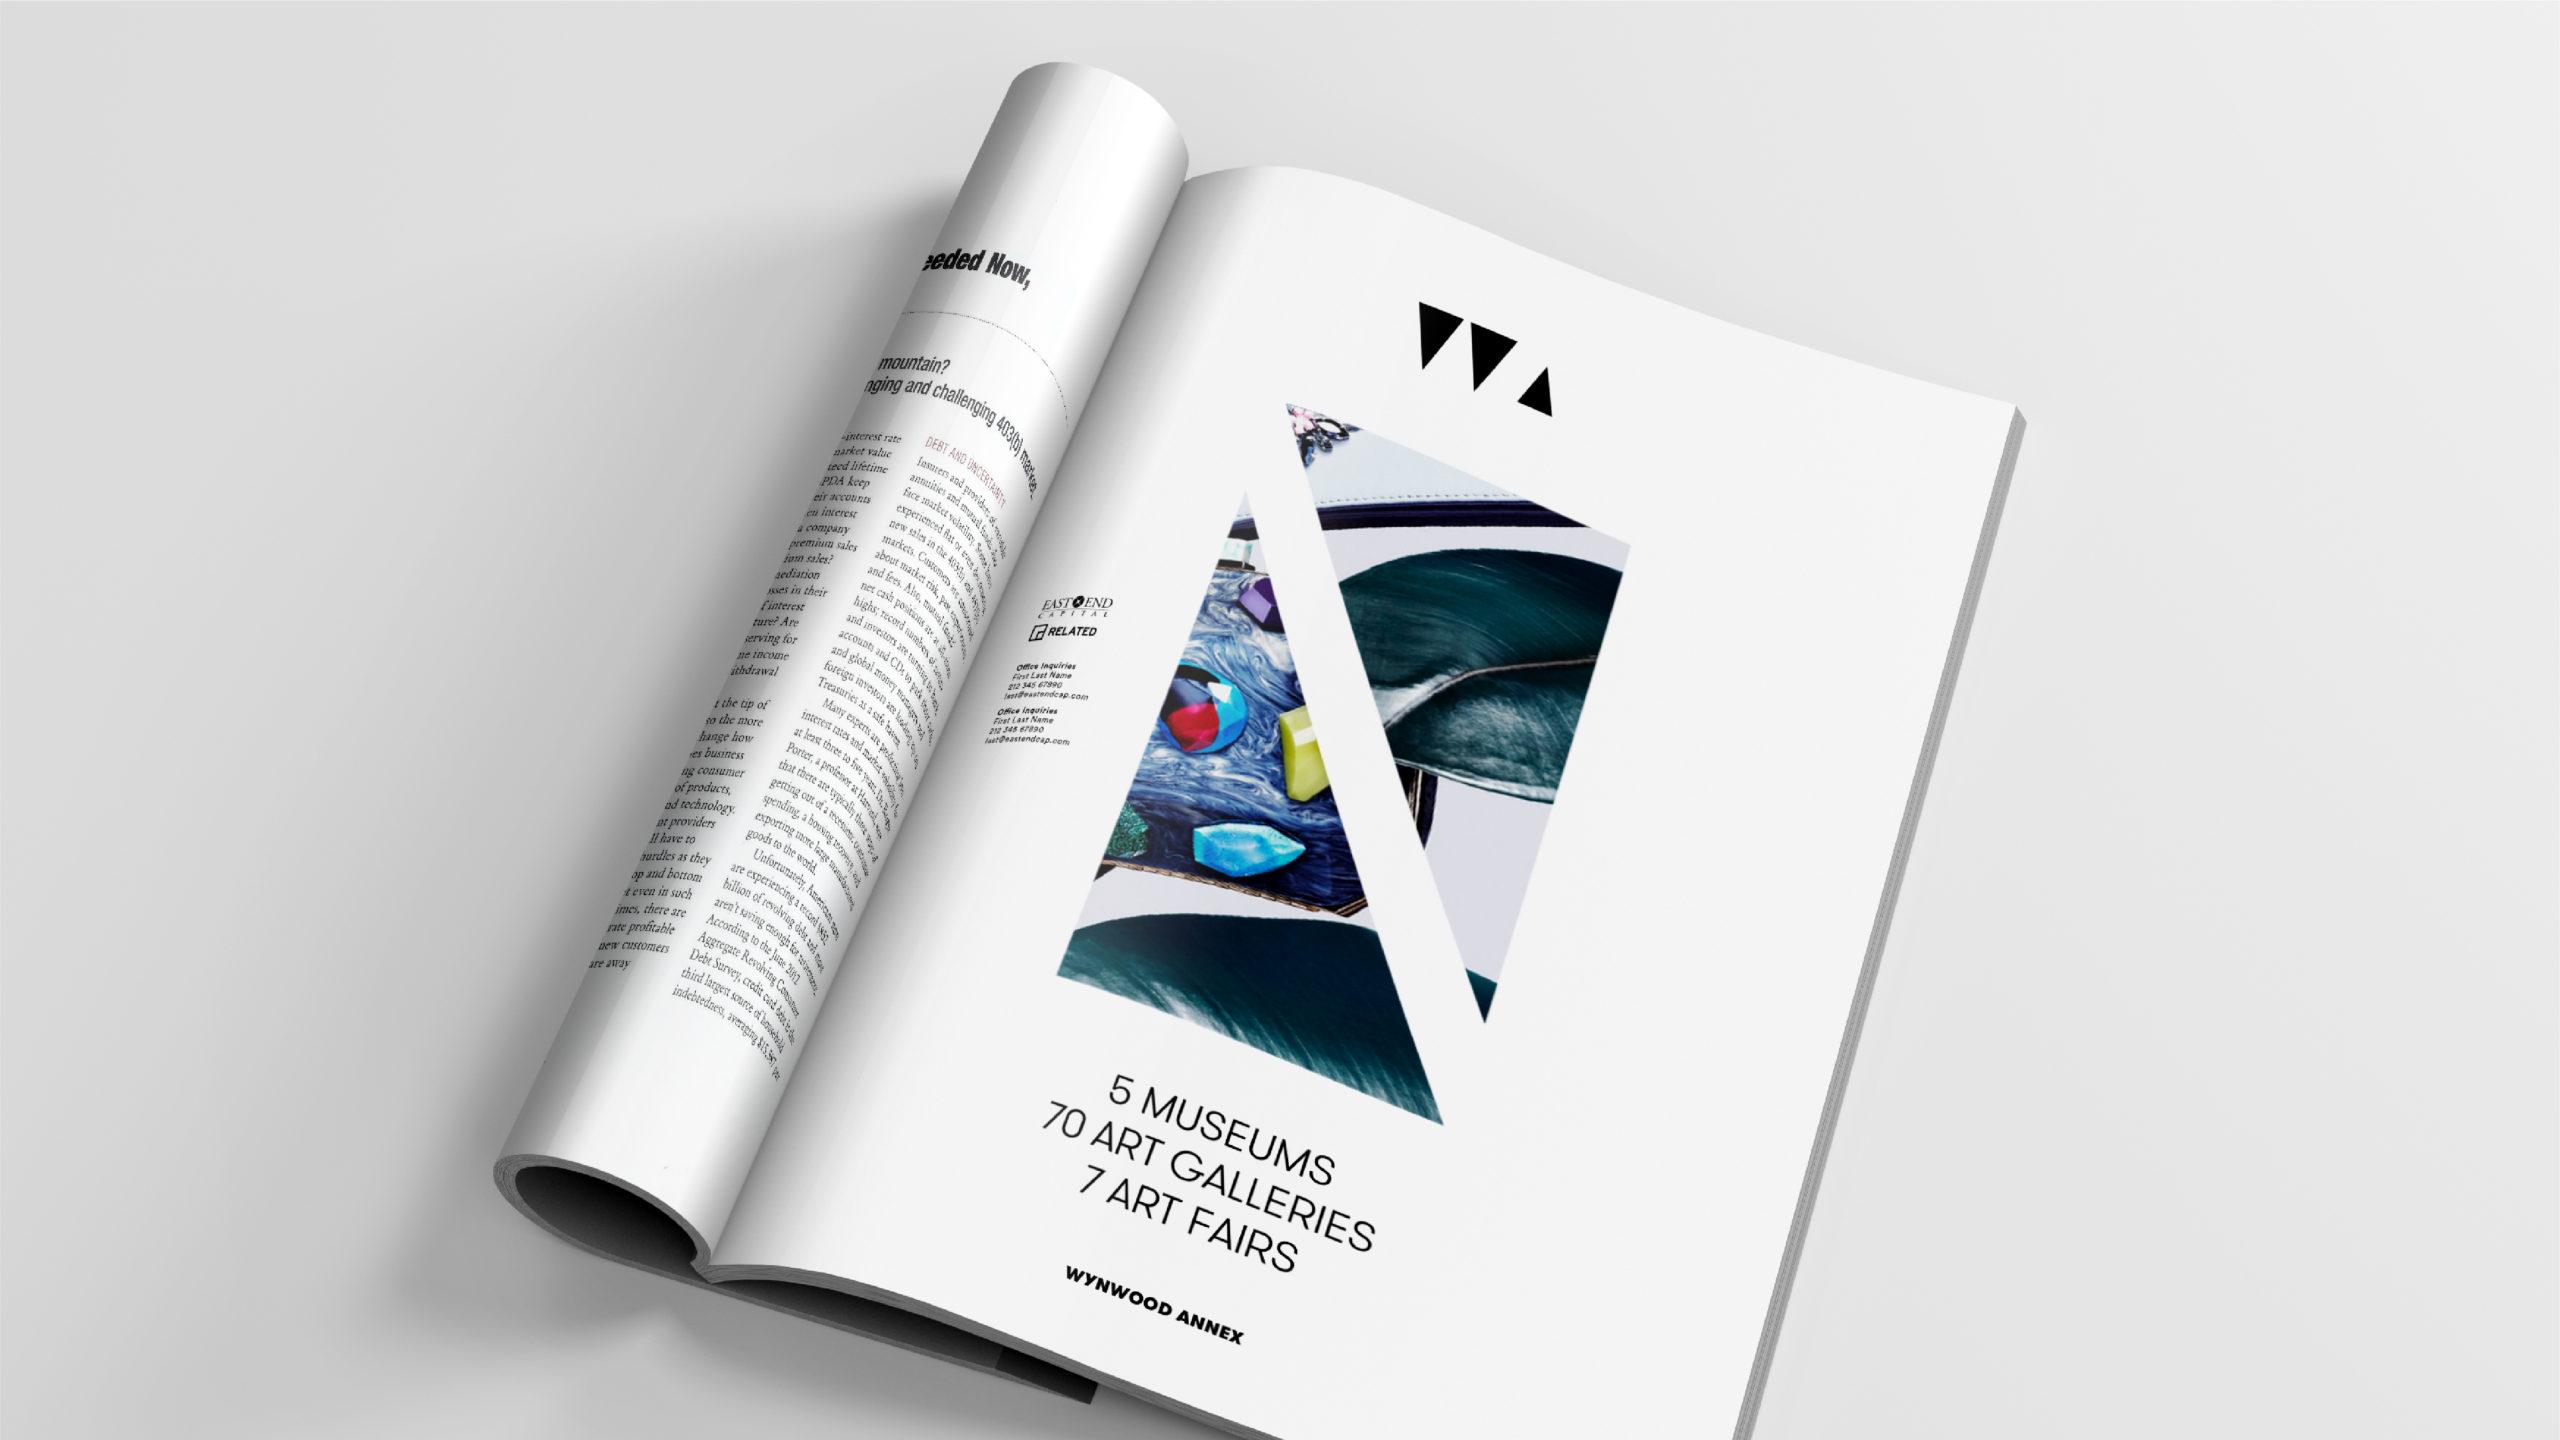 Wynwood-Annex_-concept-2_r3-21